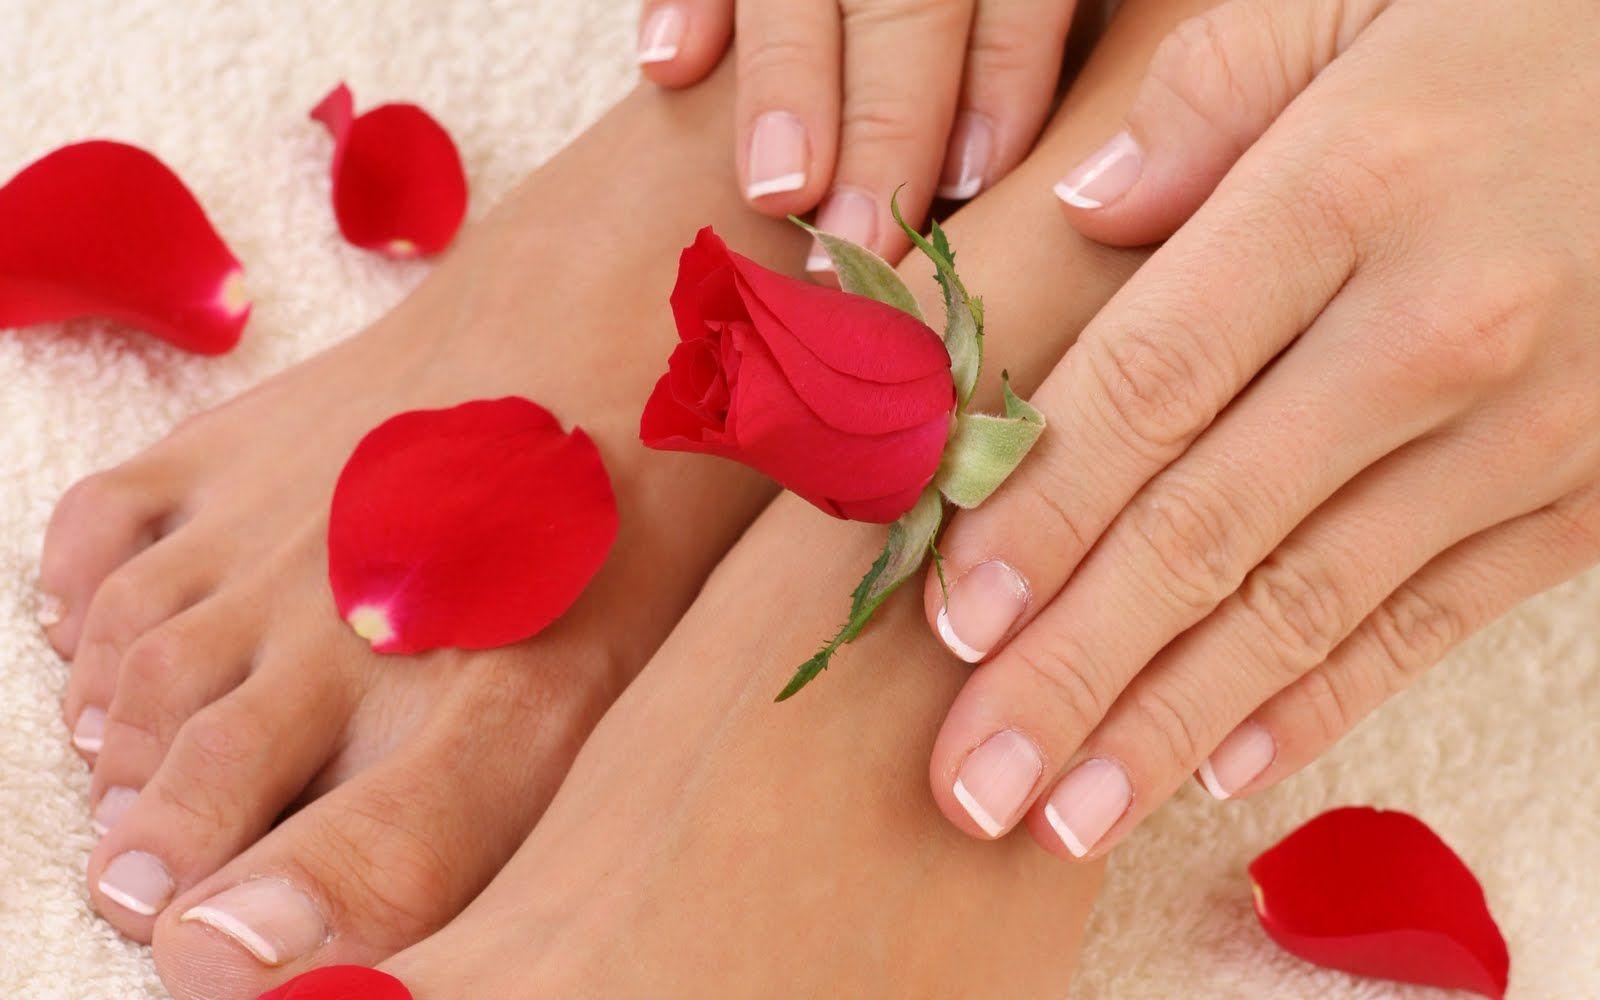 Healthy Nails Tips Nagel Zomer Essie Nagellak Witte Nagellak